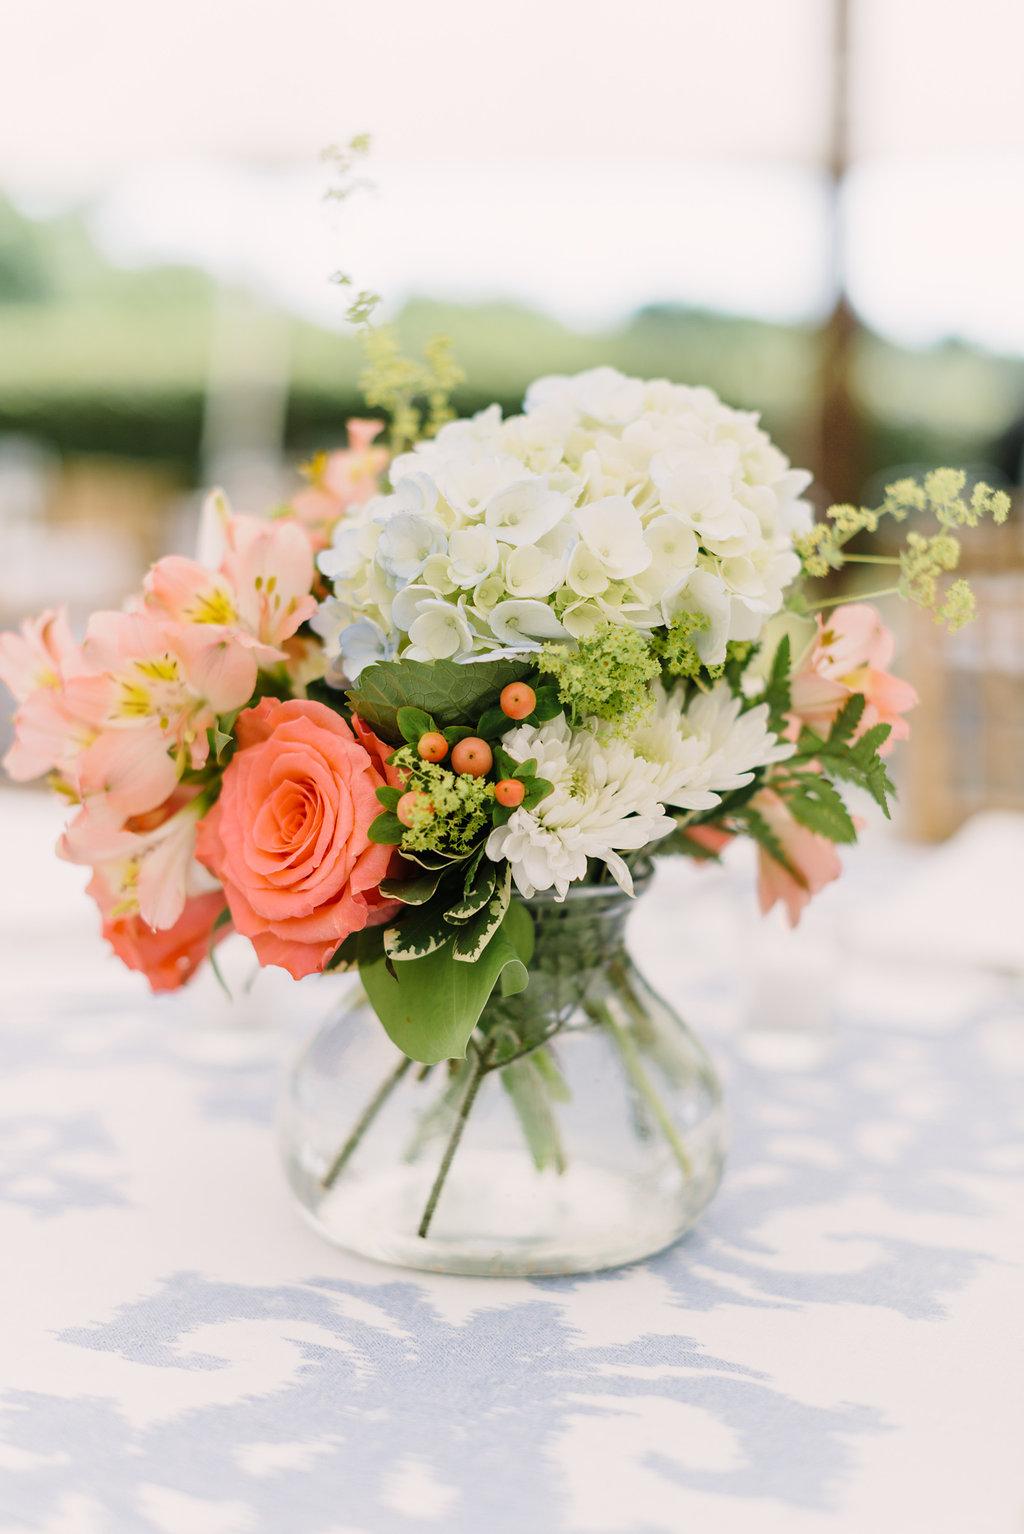 Cameron-Powel-Wes-Mize-wedding-20160618-467.jpg